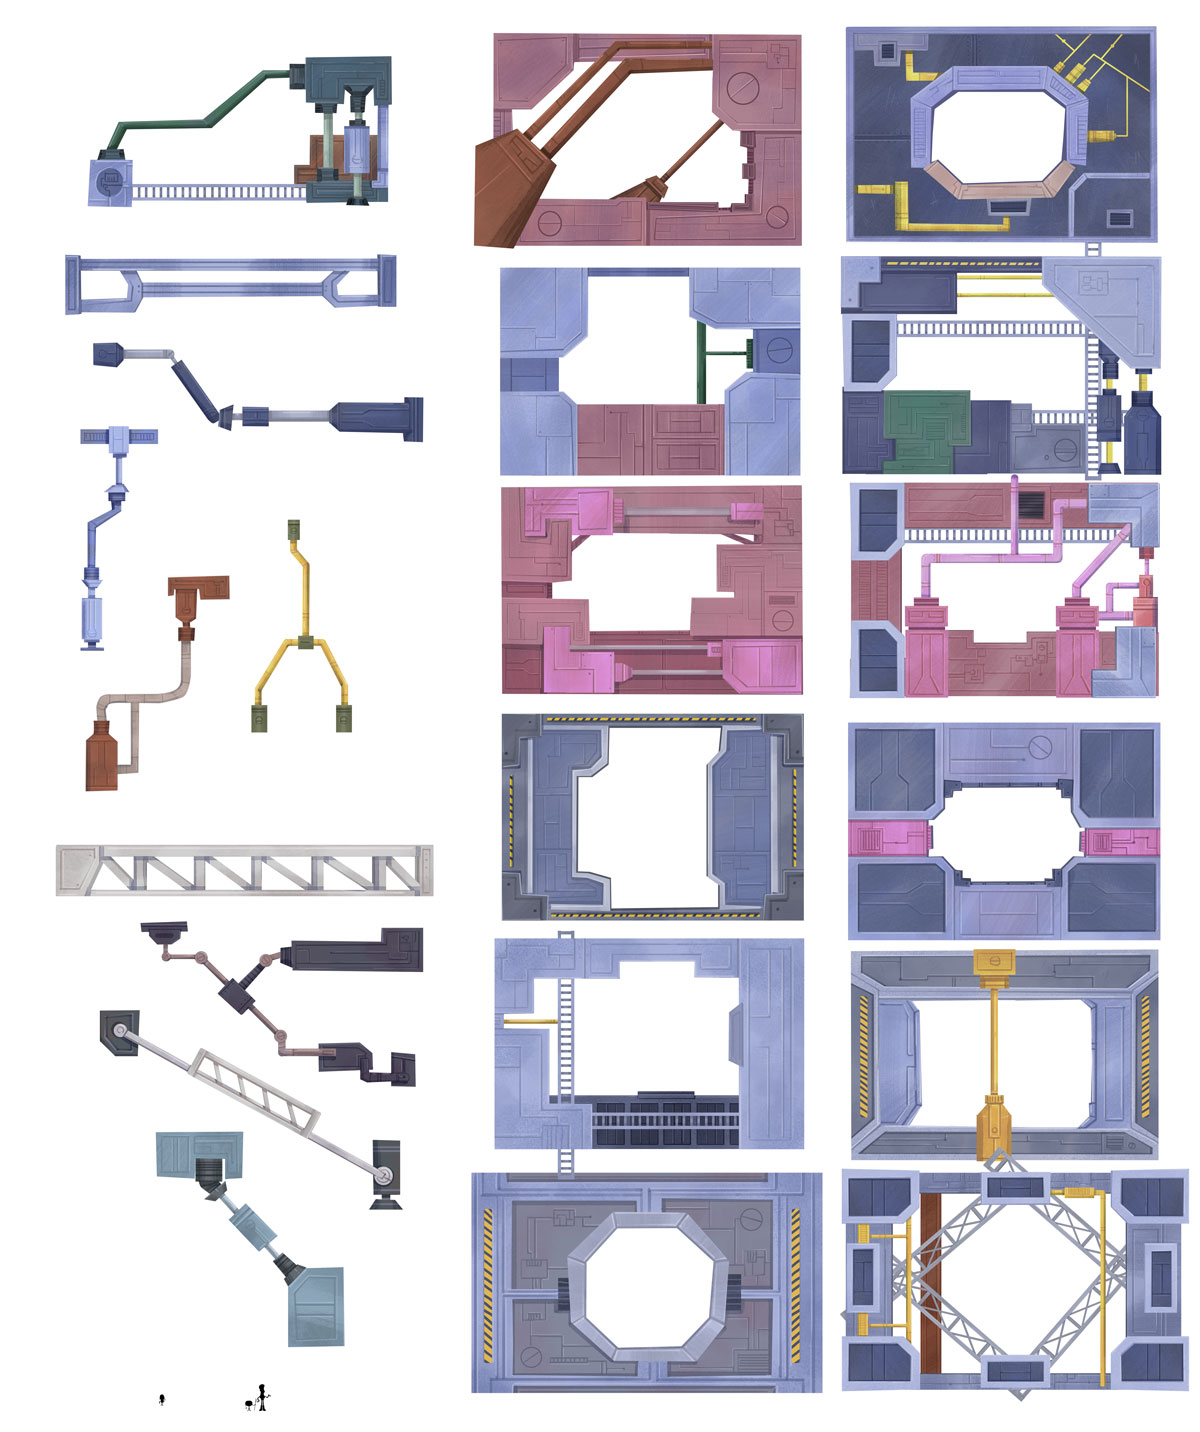 13_Tunnel_Assets_Panels.jpg